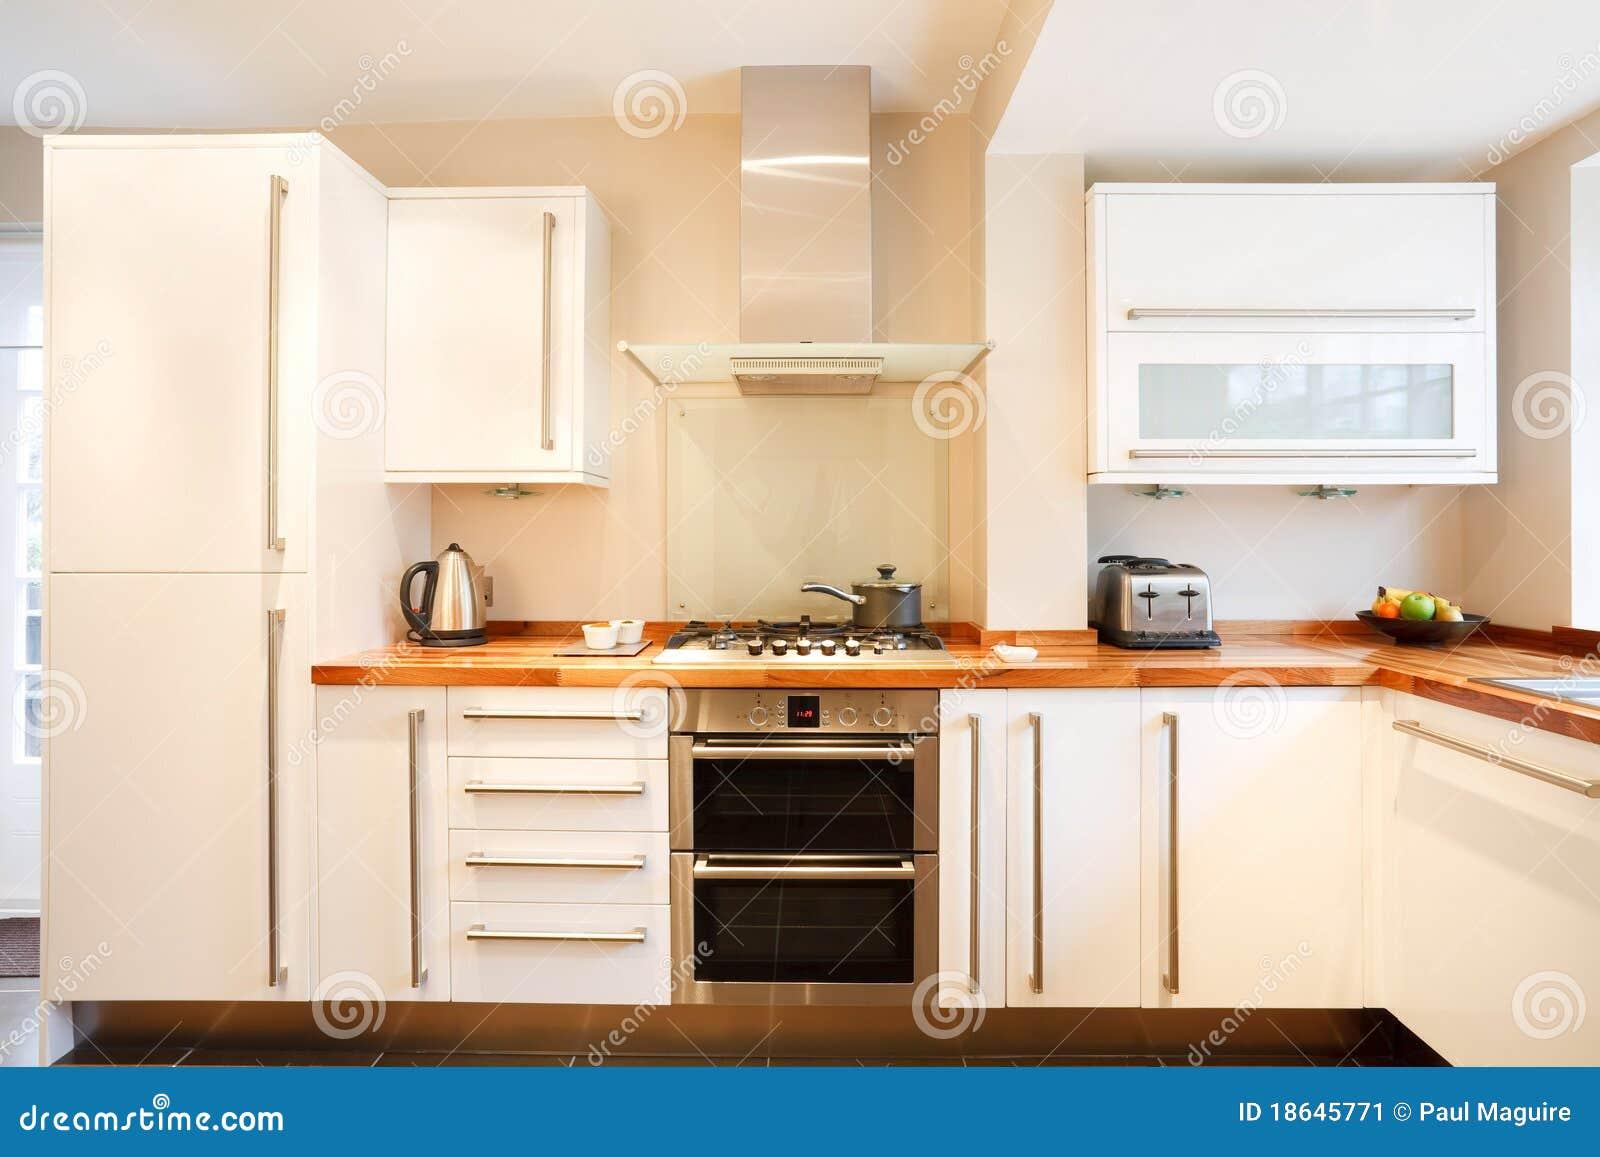 Cuisine moderne image stock image 18645771 for Achat cuisine moderne